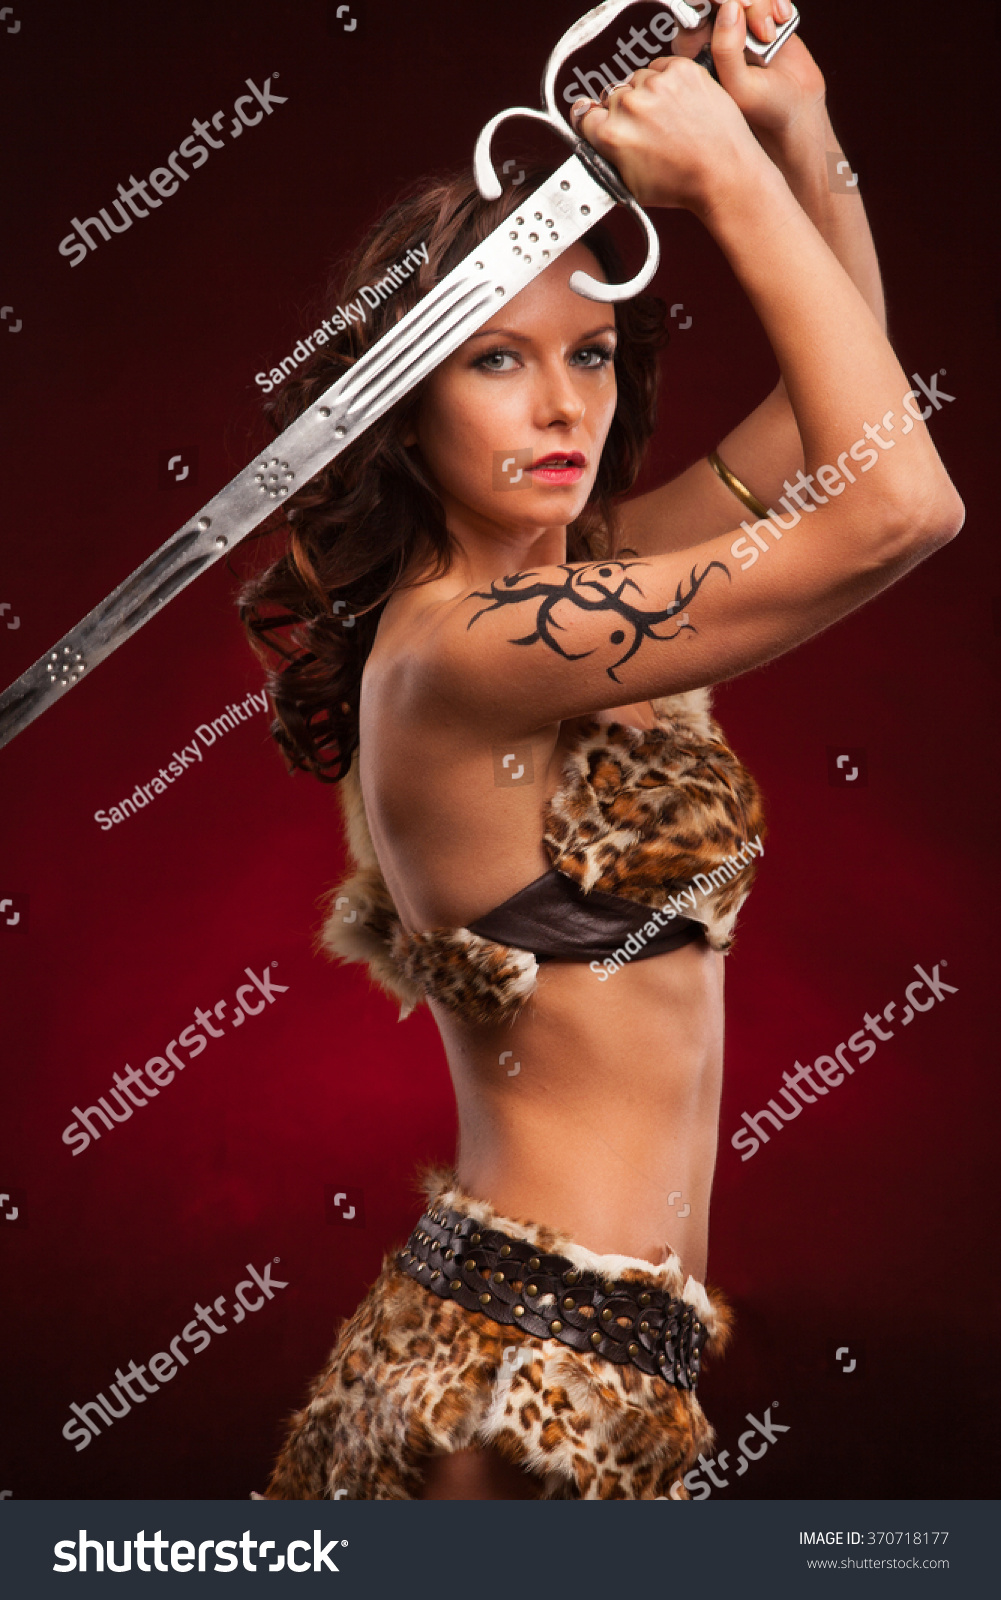 Hot barbarian woman adult scene